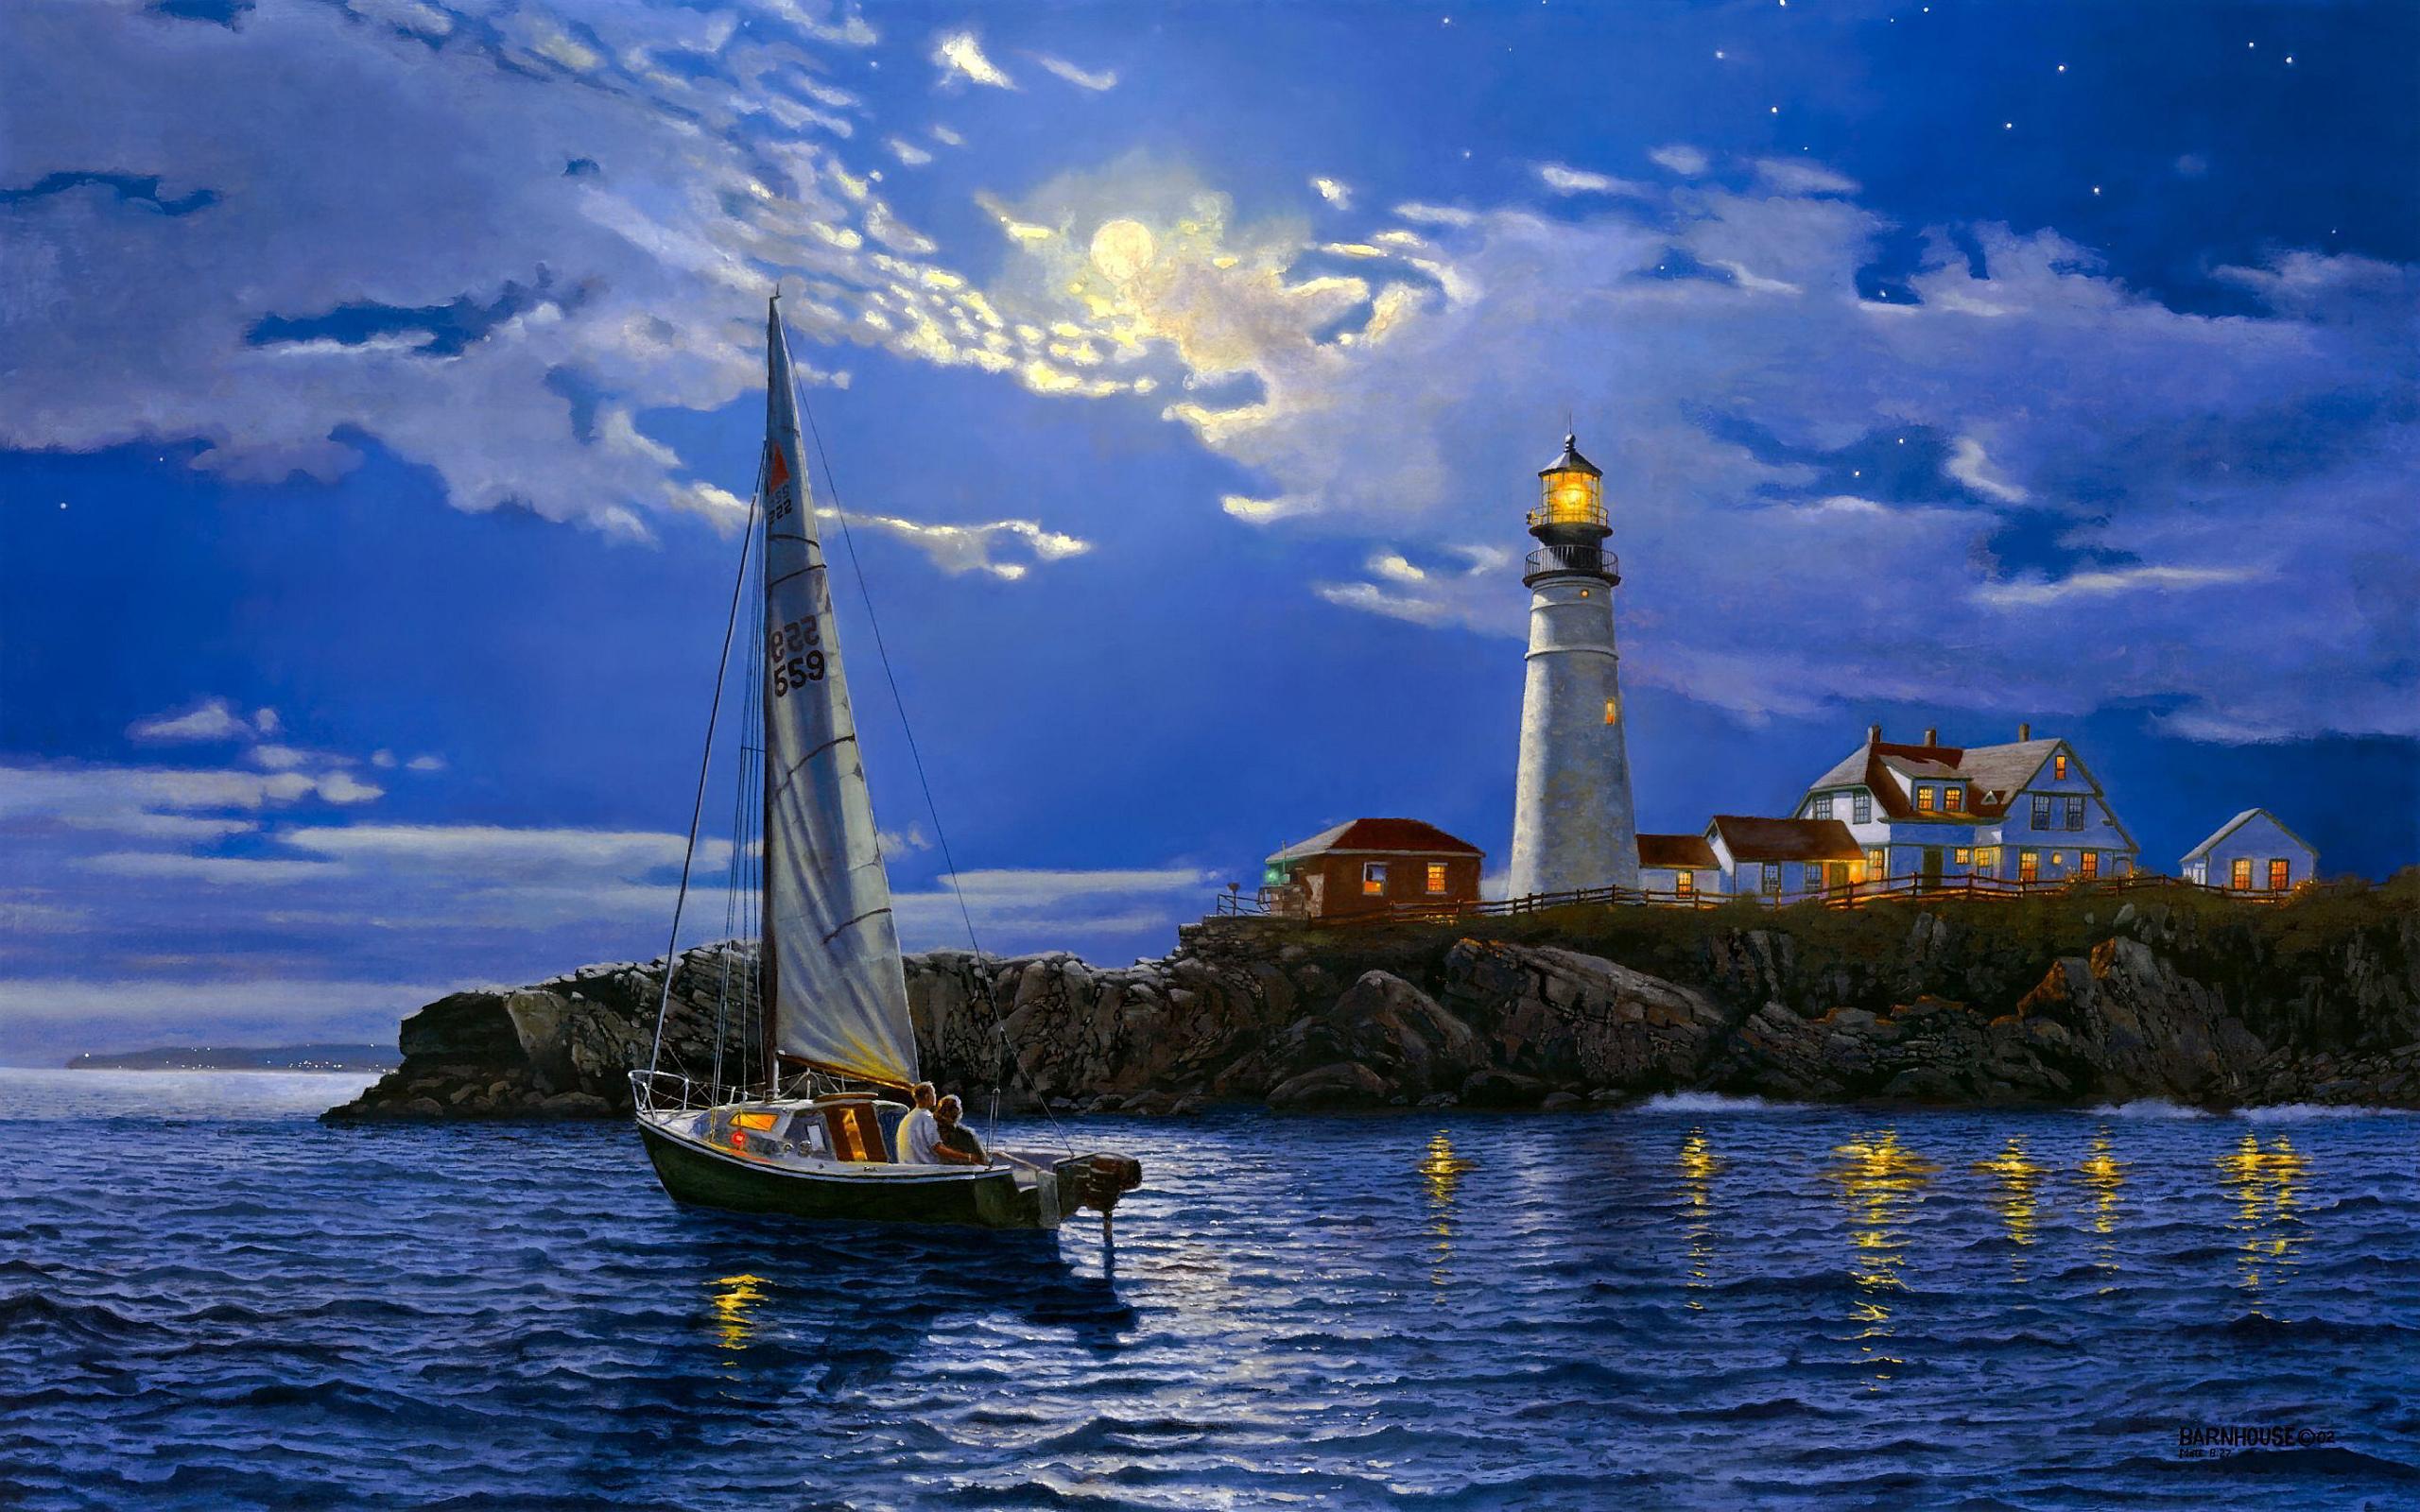 Couple lighthouse art